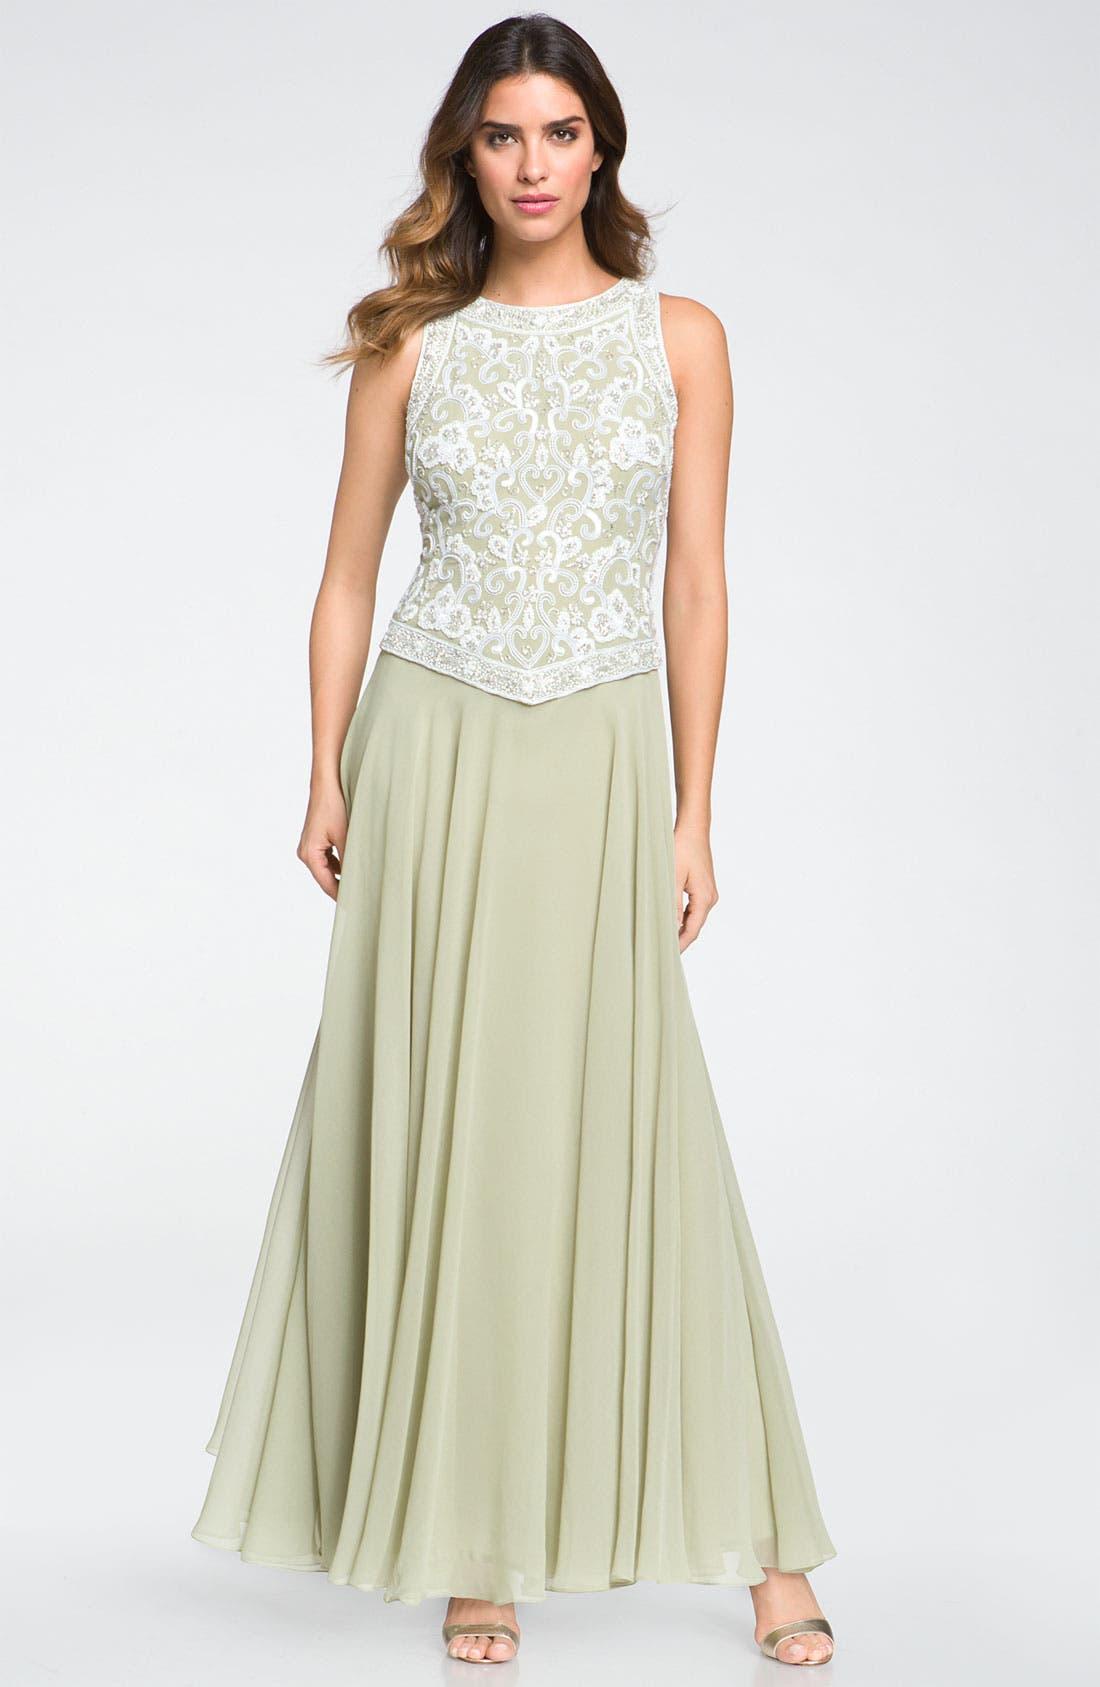 Alternate Image 1 Selected - J Kara Embellished Sleeveless Crepe Gown (Petite)